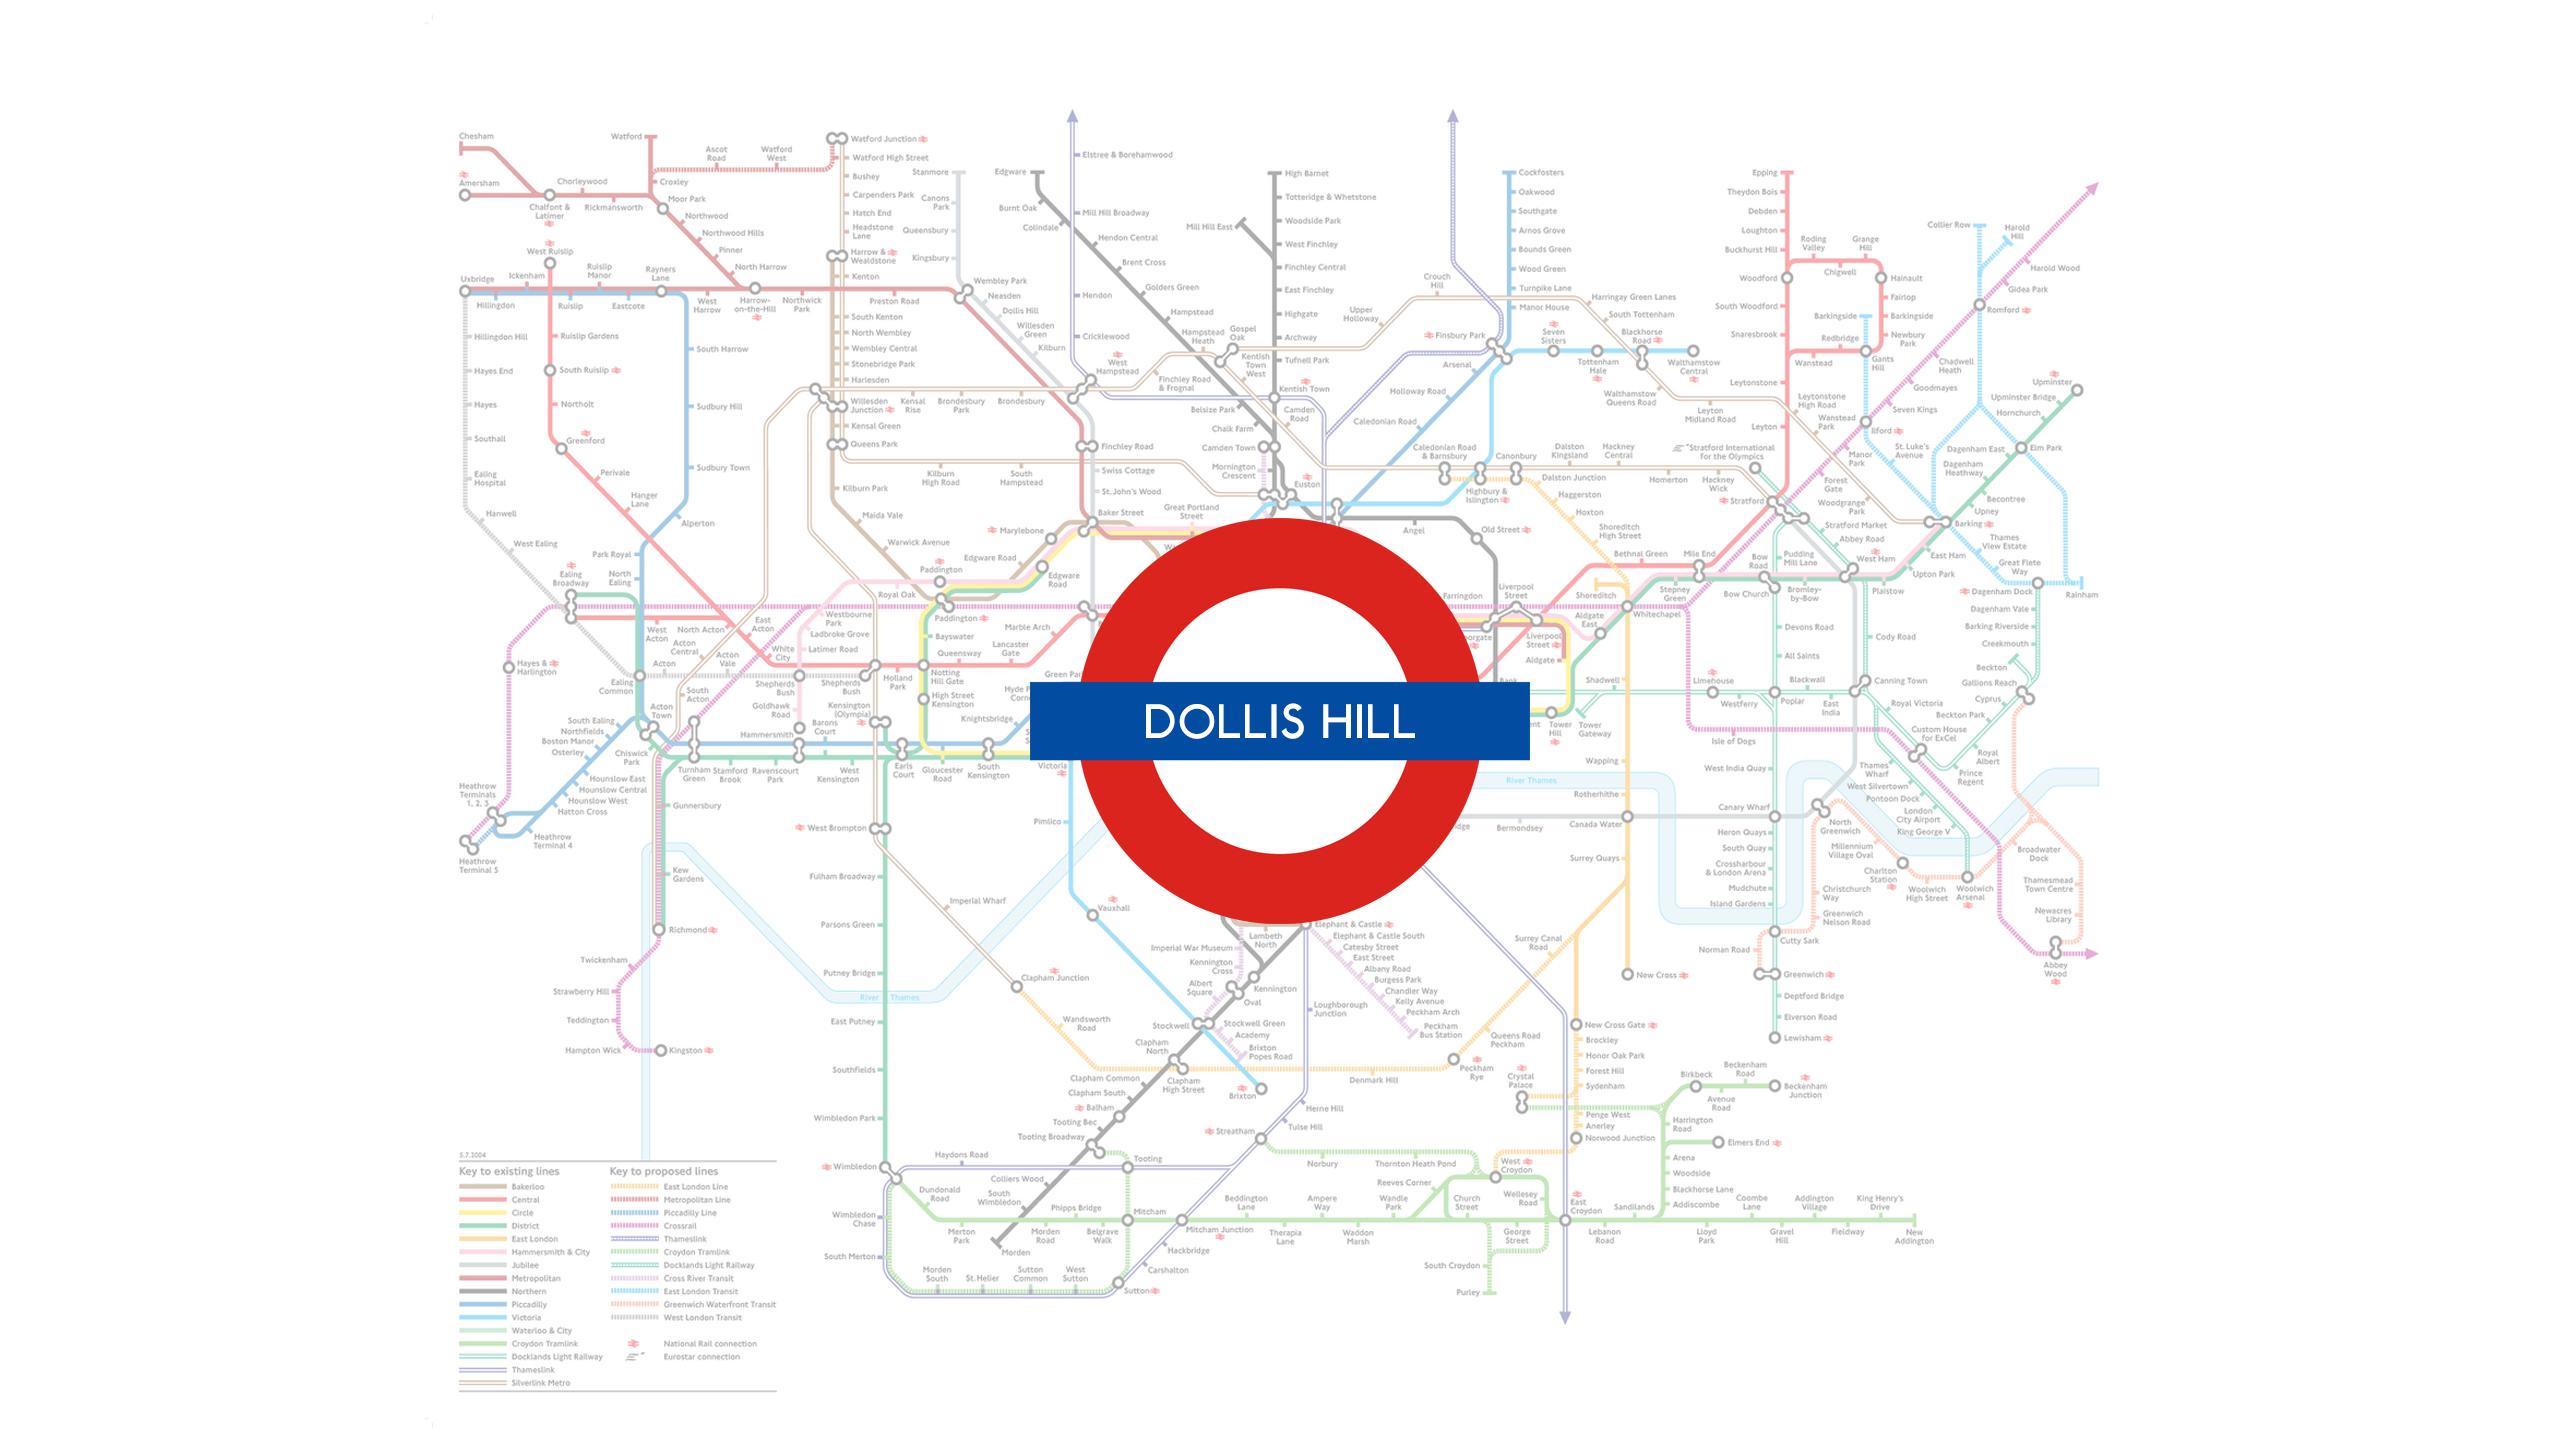 Dollis Hill (Map)